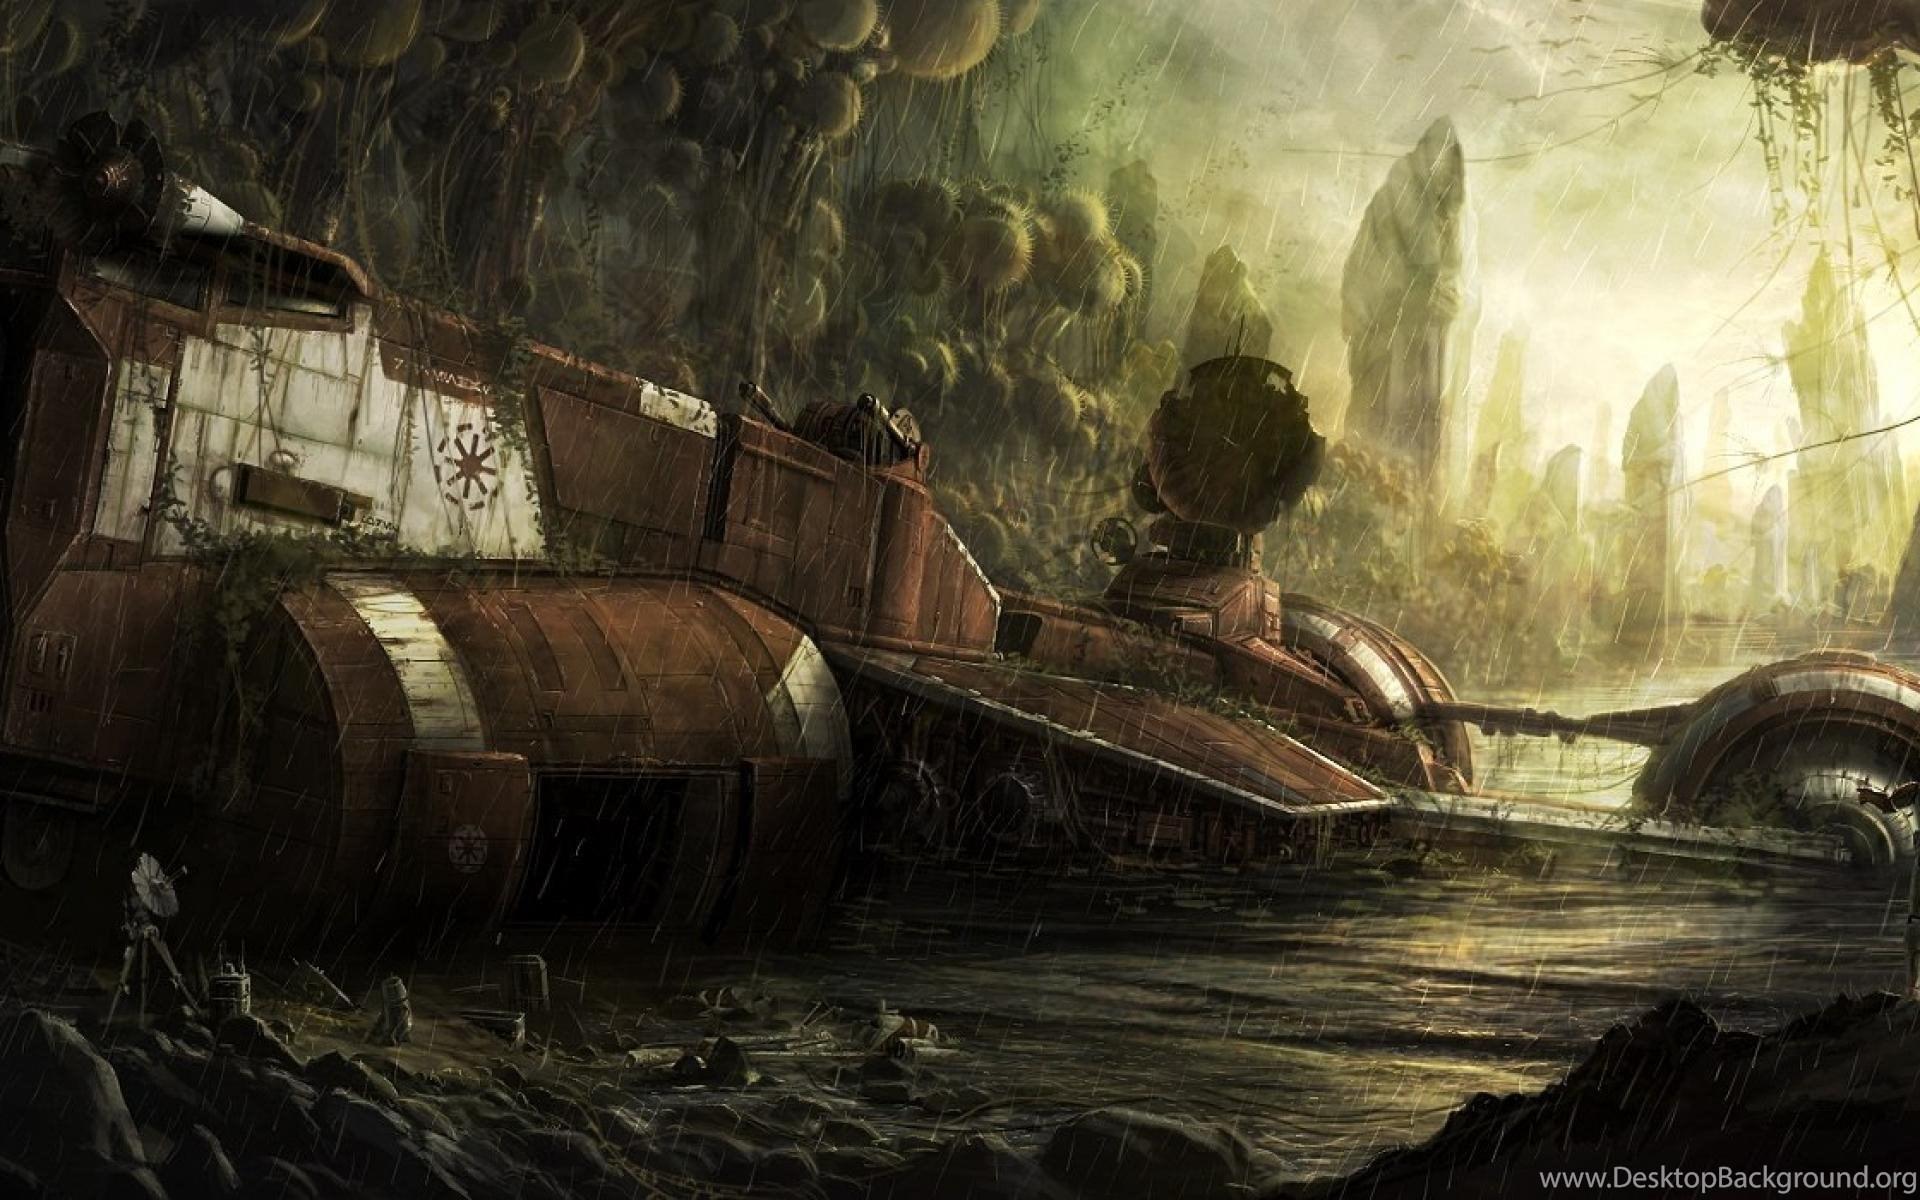 Star Wars Crash Clone Trooper Digital Art HD Wallpapers